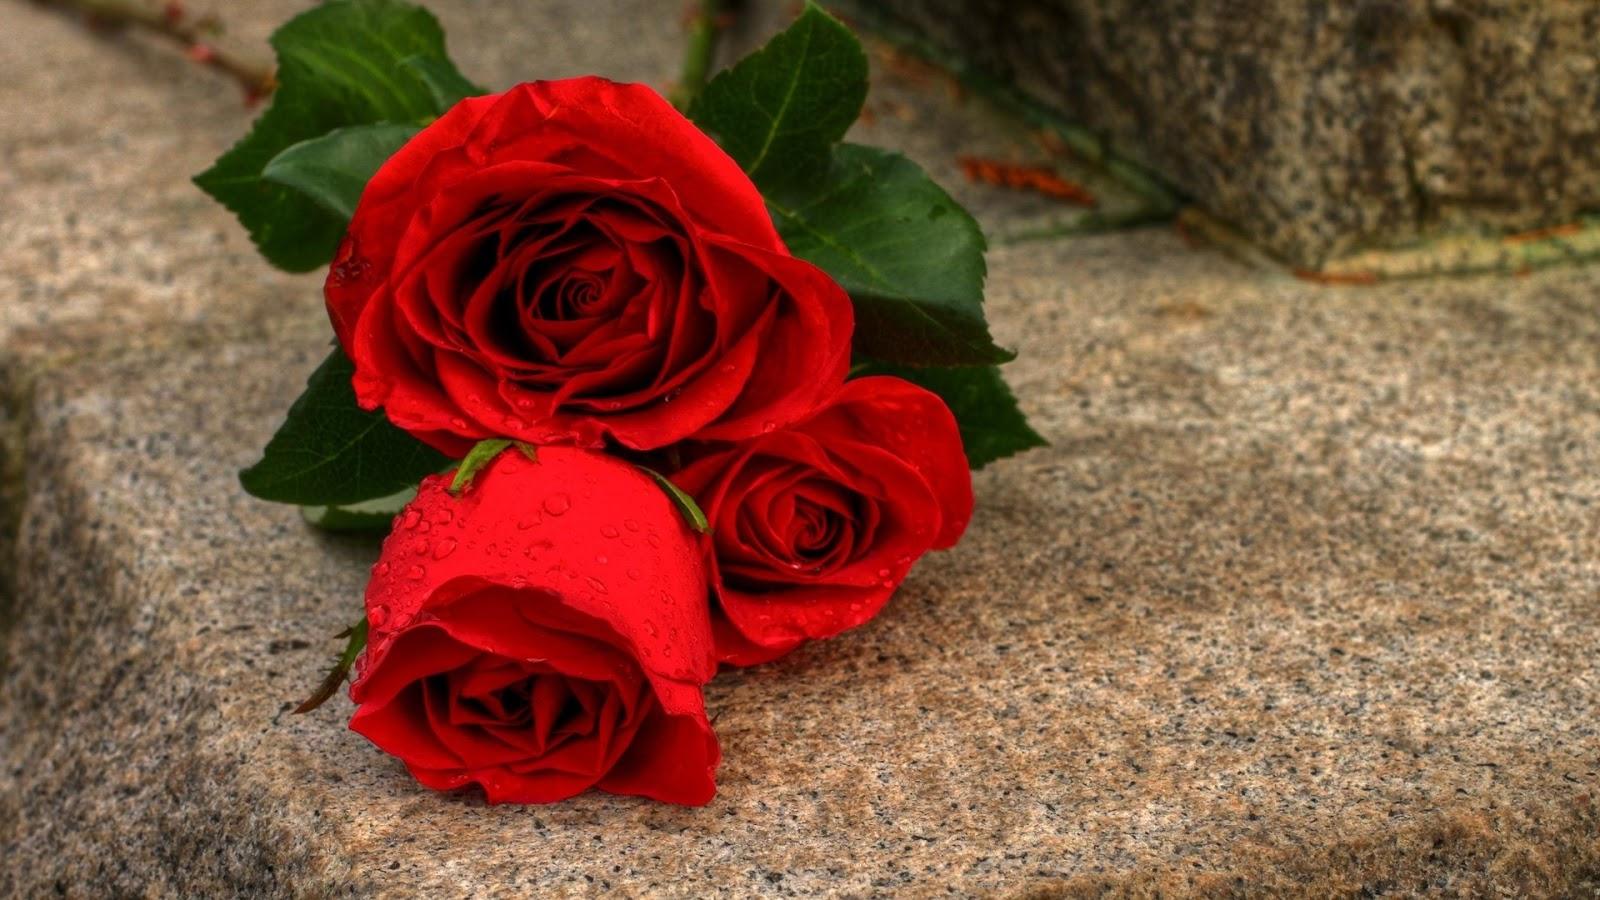 Rose Flower HD Wallpaper